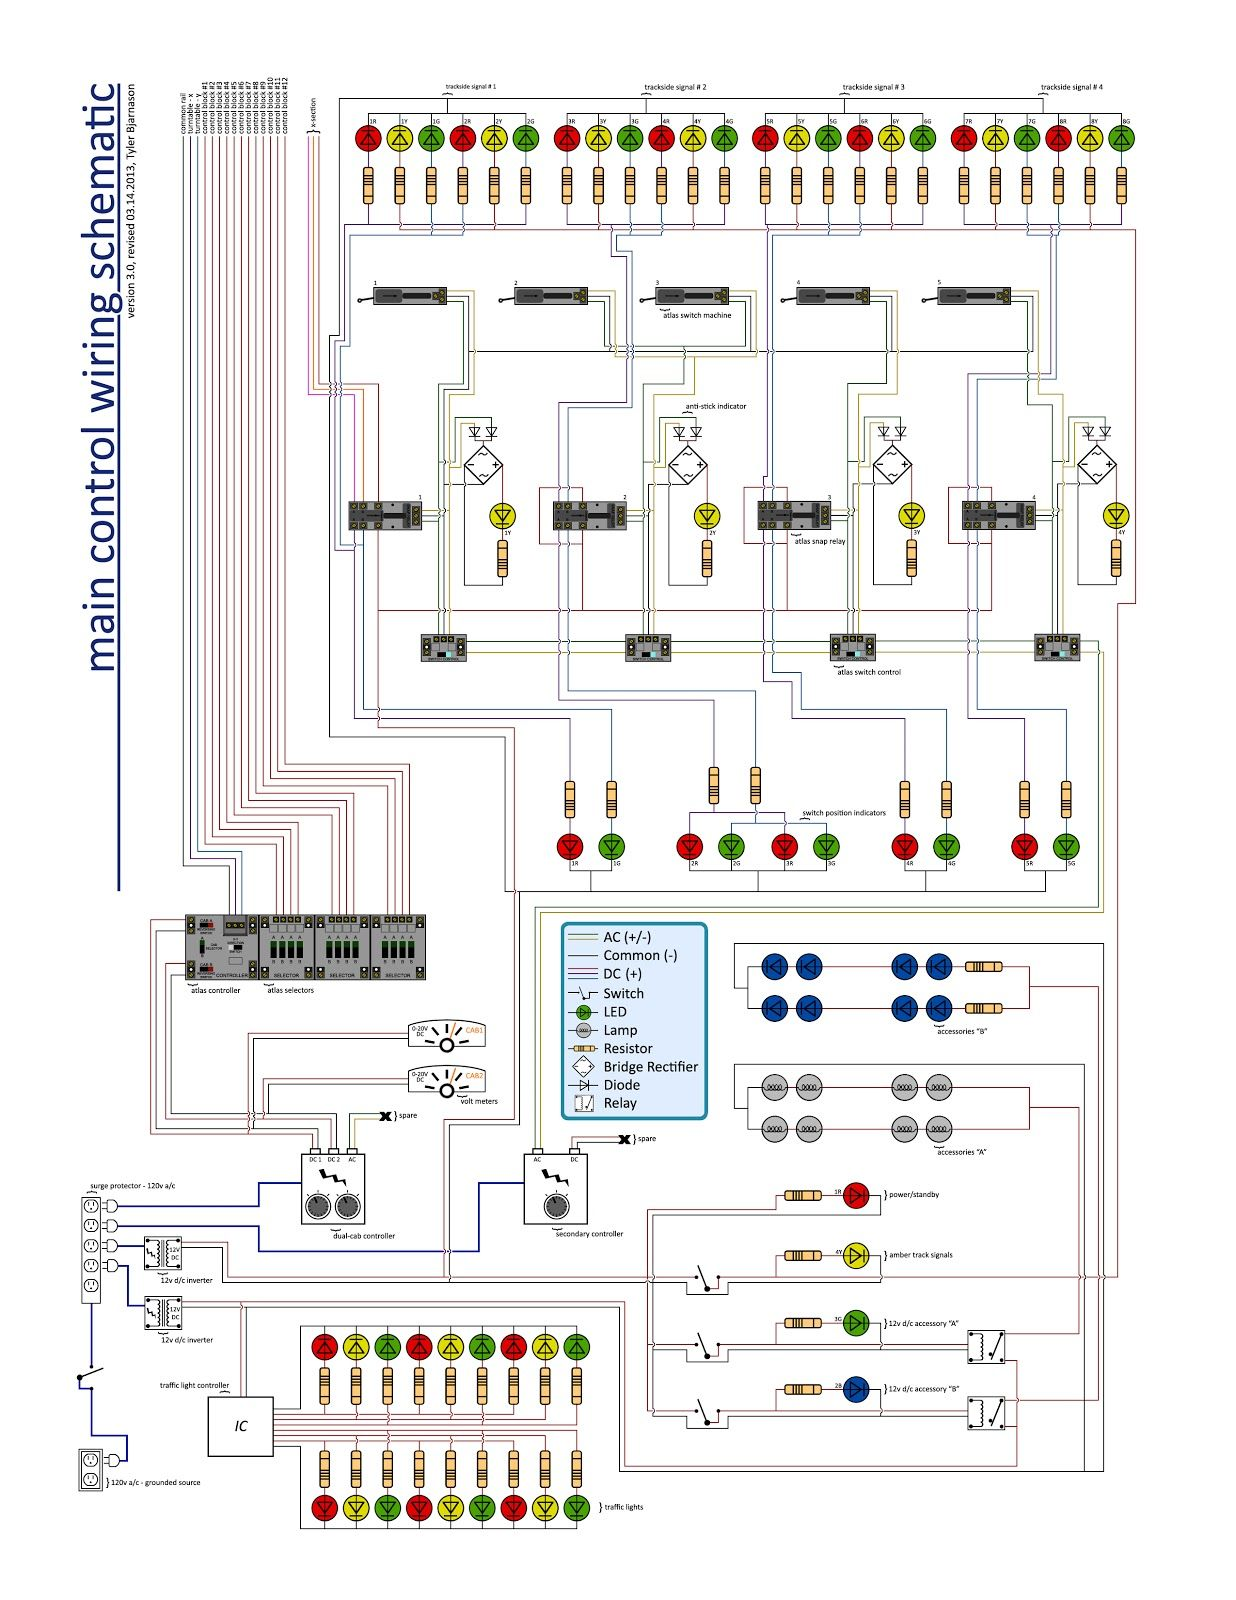 medium resolution of train wiring diagram wiring diagram schematics rh ksefanzone com bachmann train wiring diagrams model train wiring diagrams